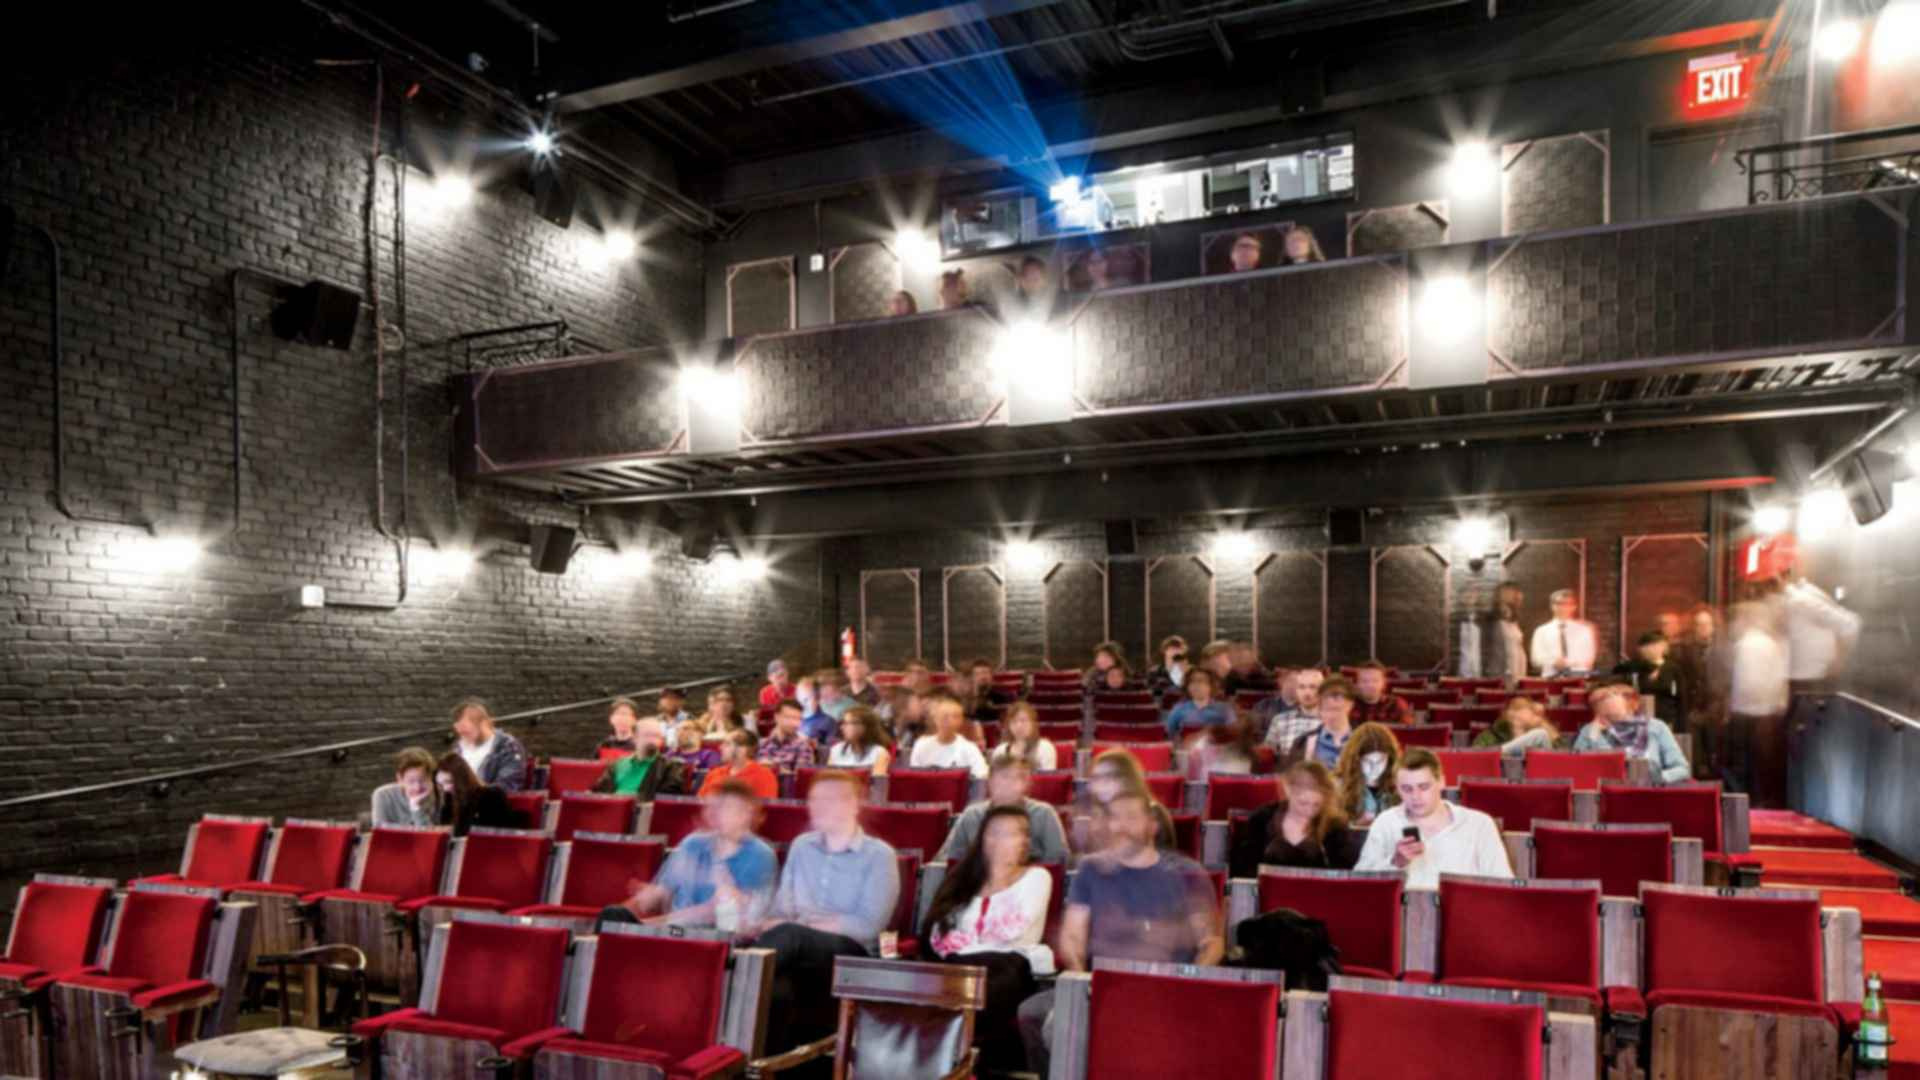 Metrograph Indie Cinema - theater